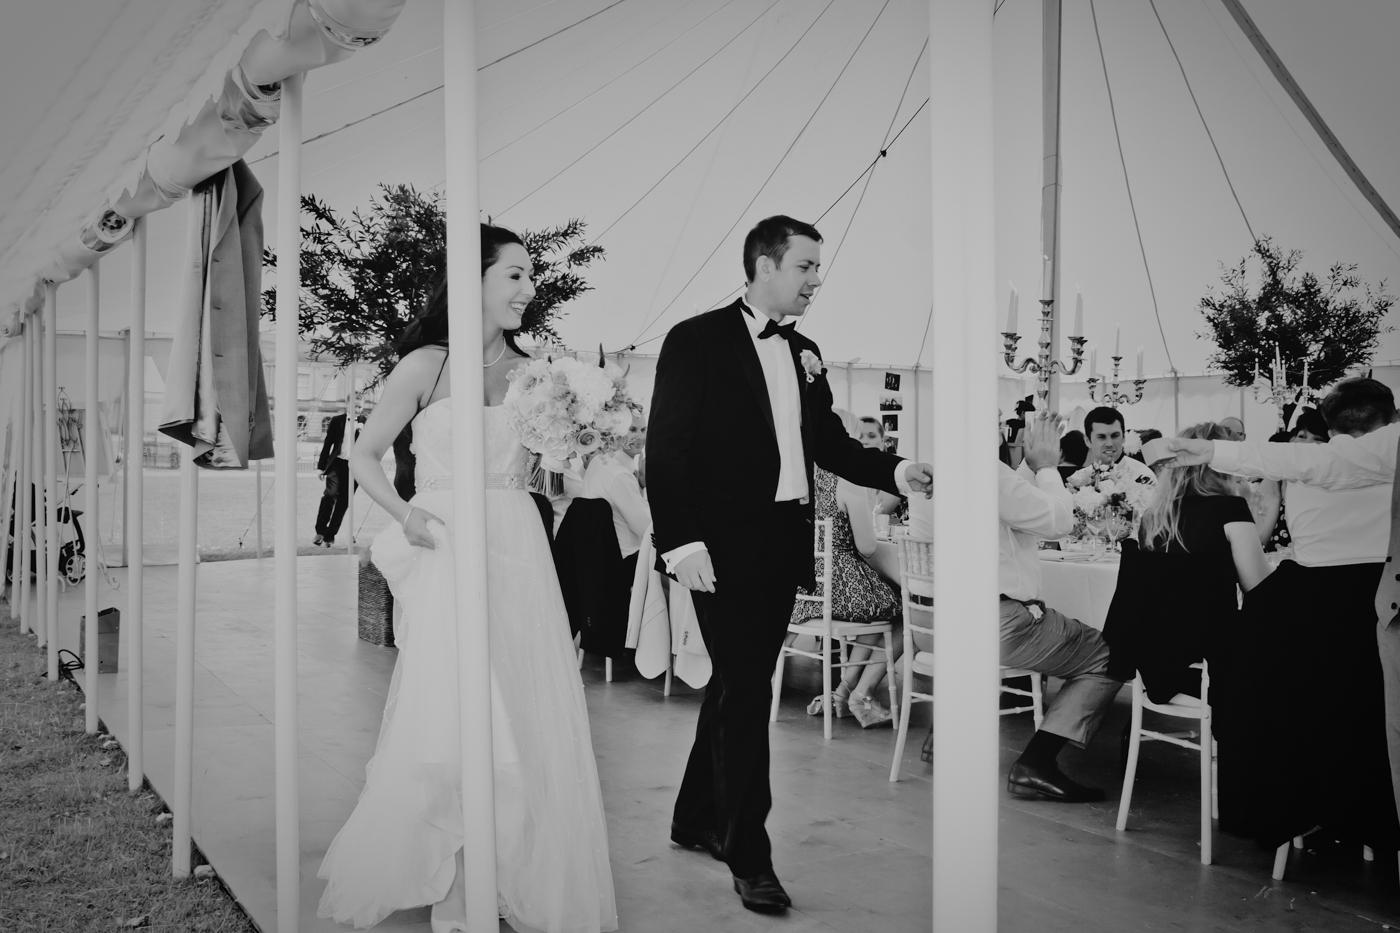 146 - Abi and Chris at Kedleston Hall - Wedding Photography by Mark Pugh www.markpugh.com - 5662.JPG